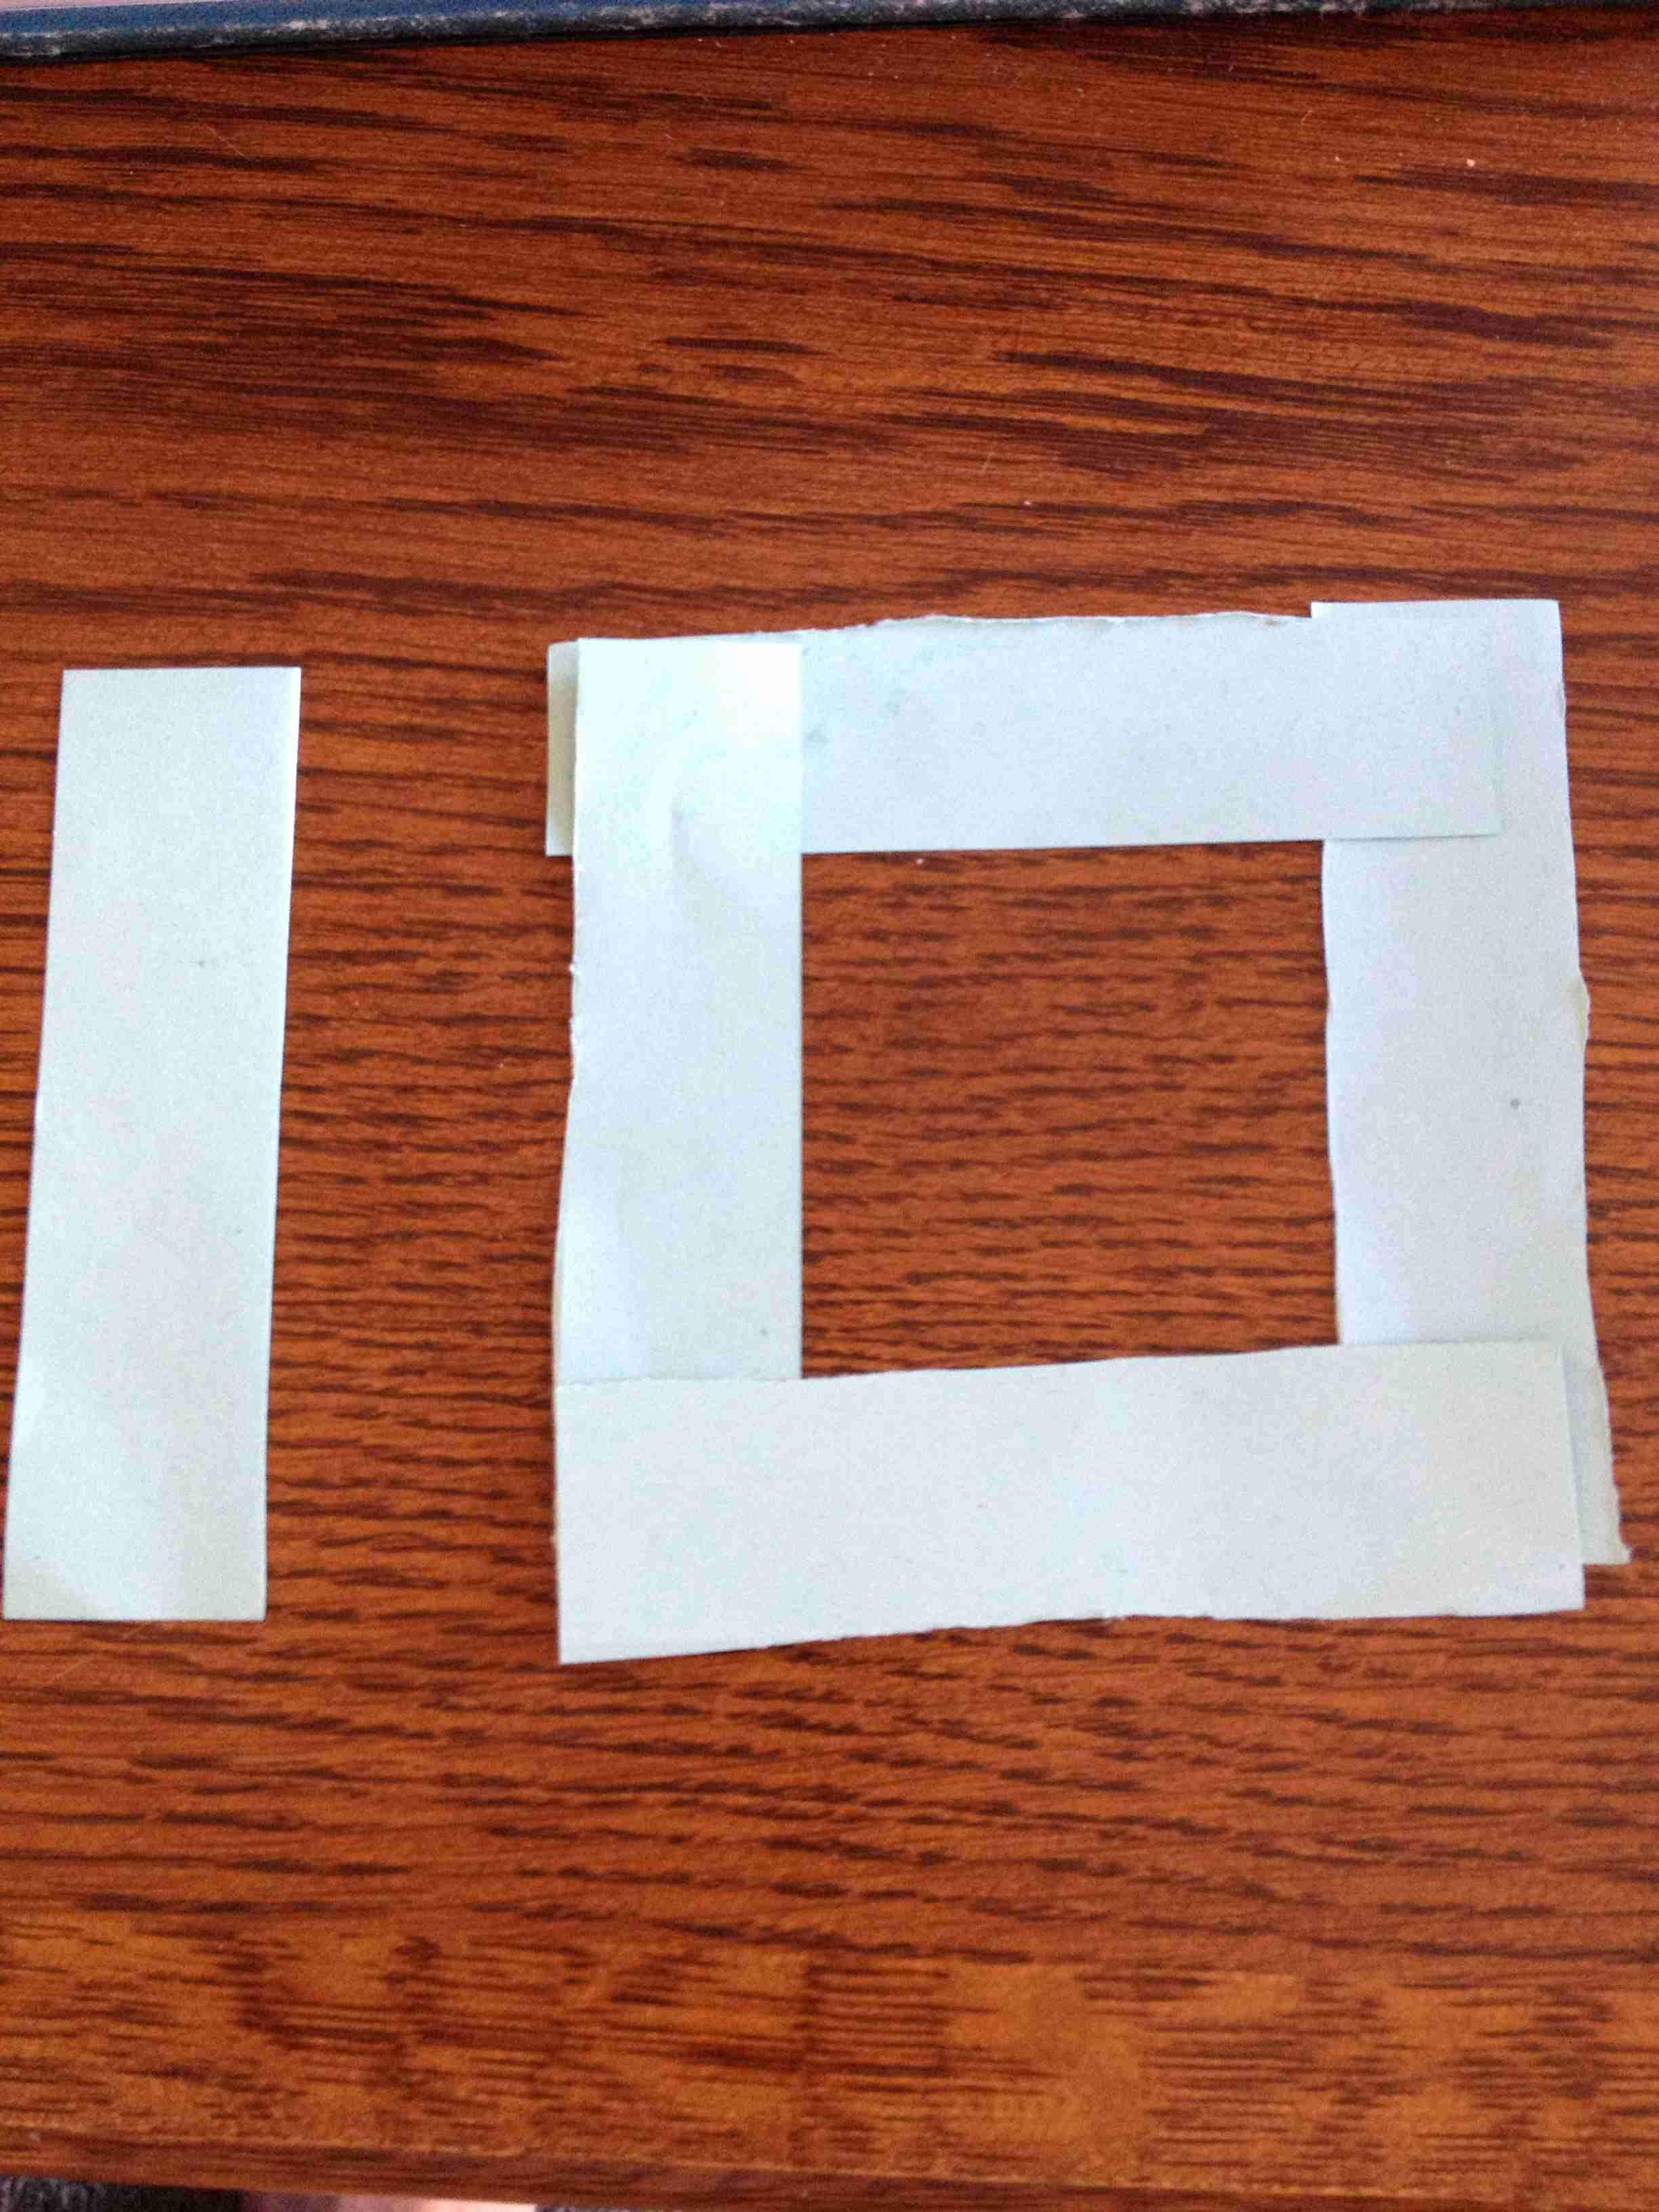 10 Commandments Paper Strips